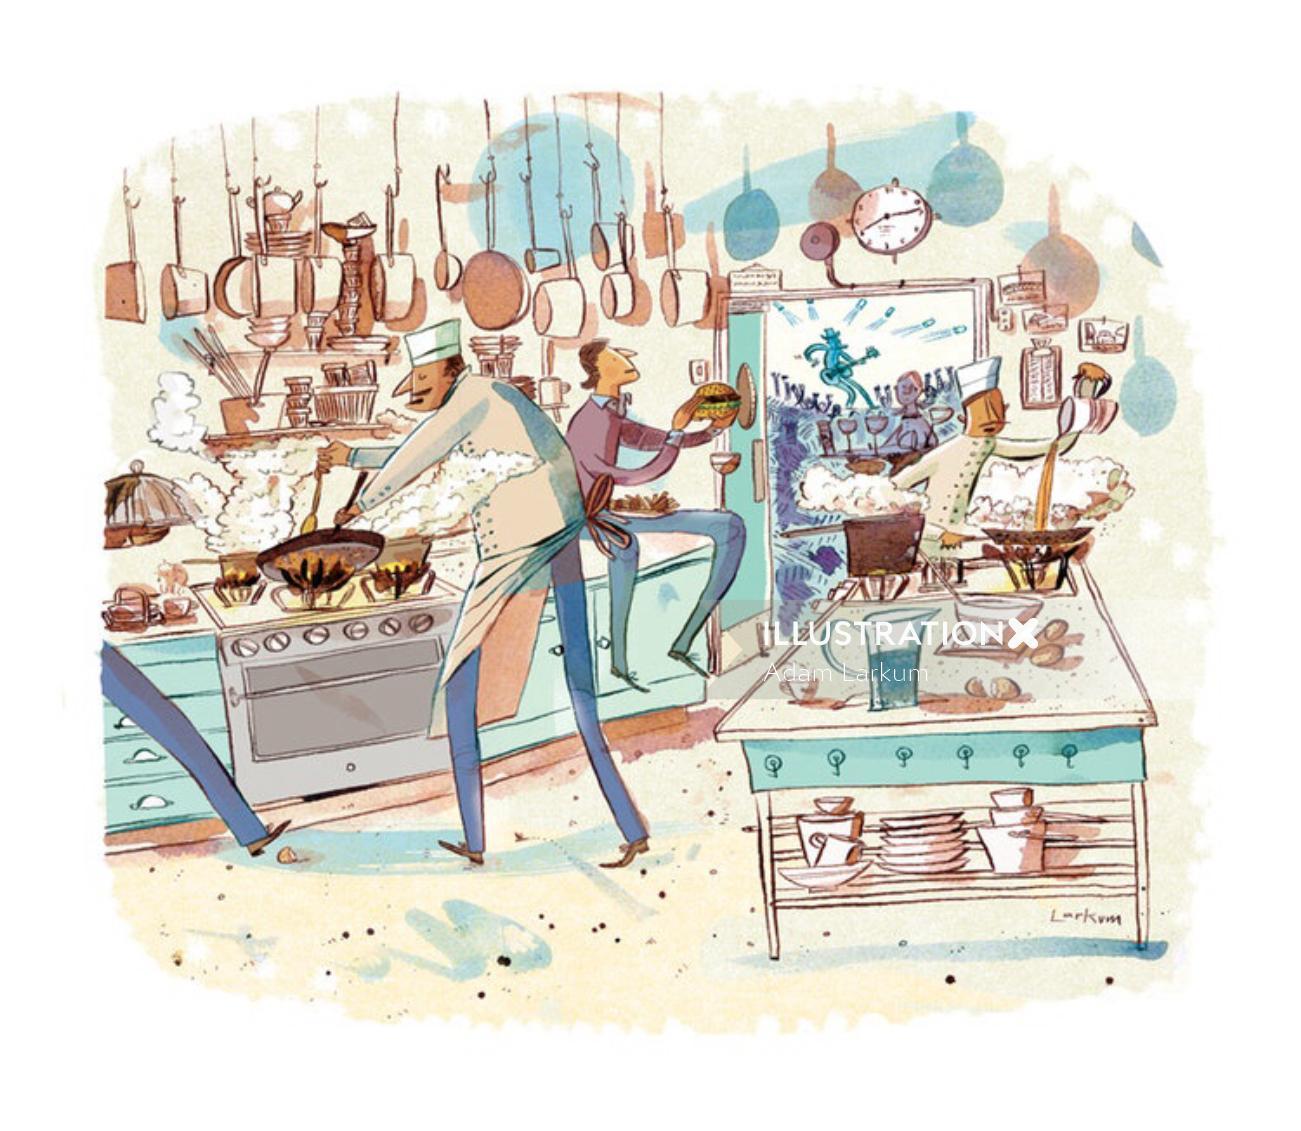 Editorial illustration for Gulfshore Life magazine